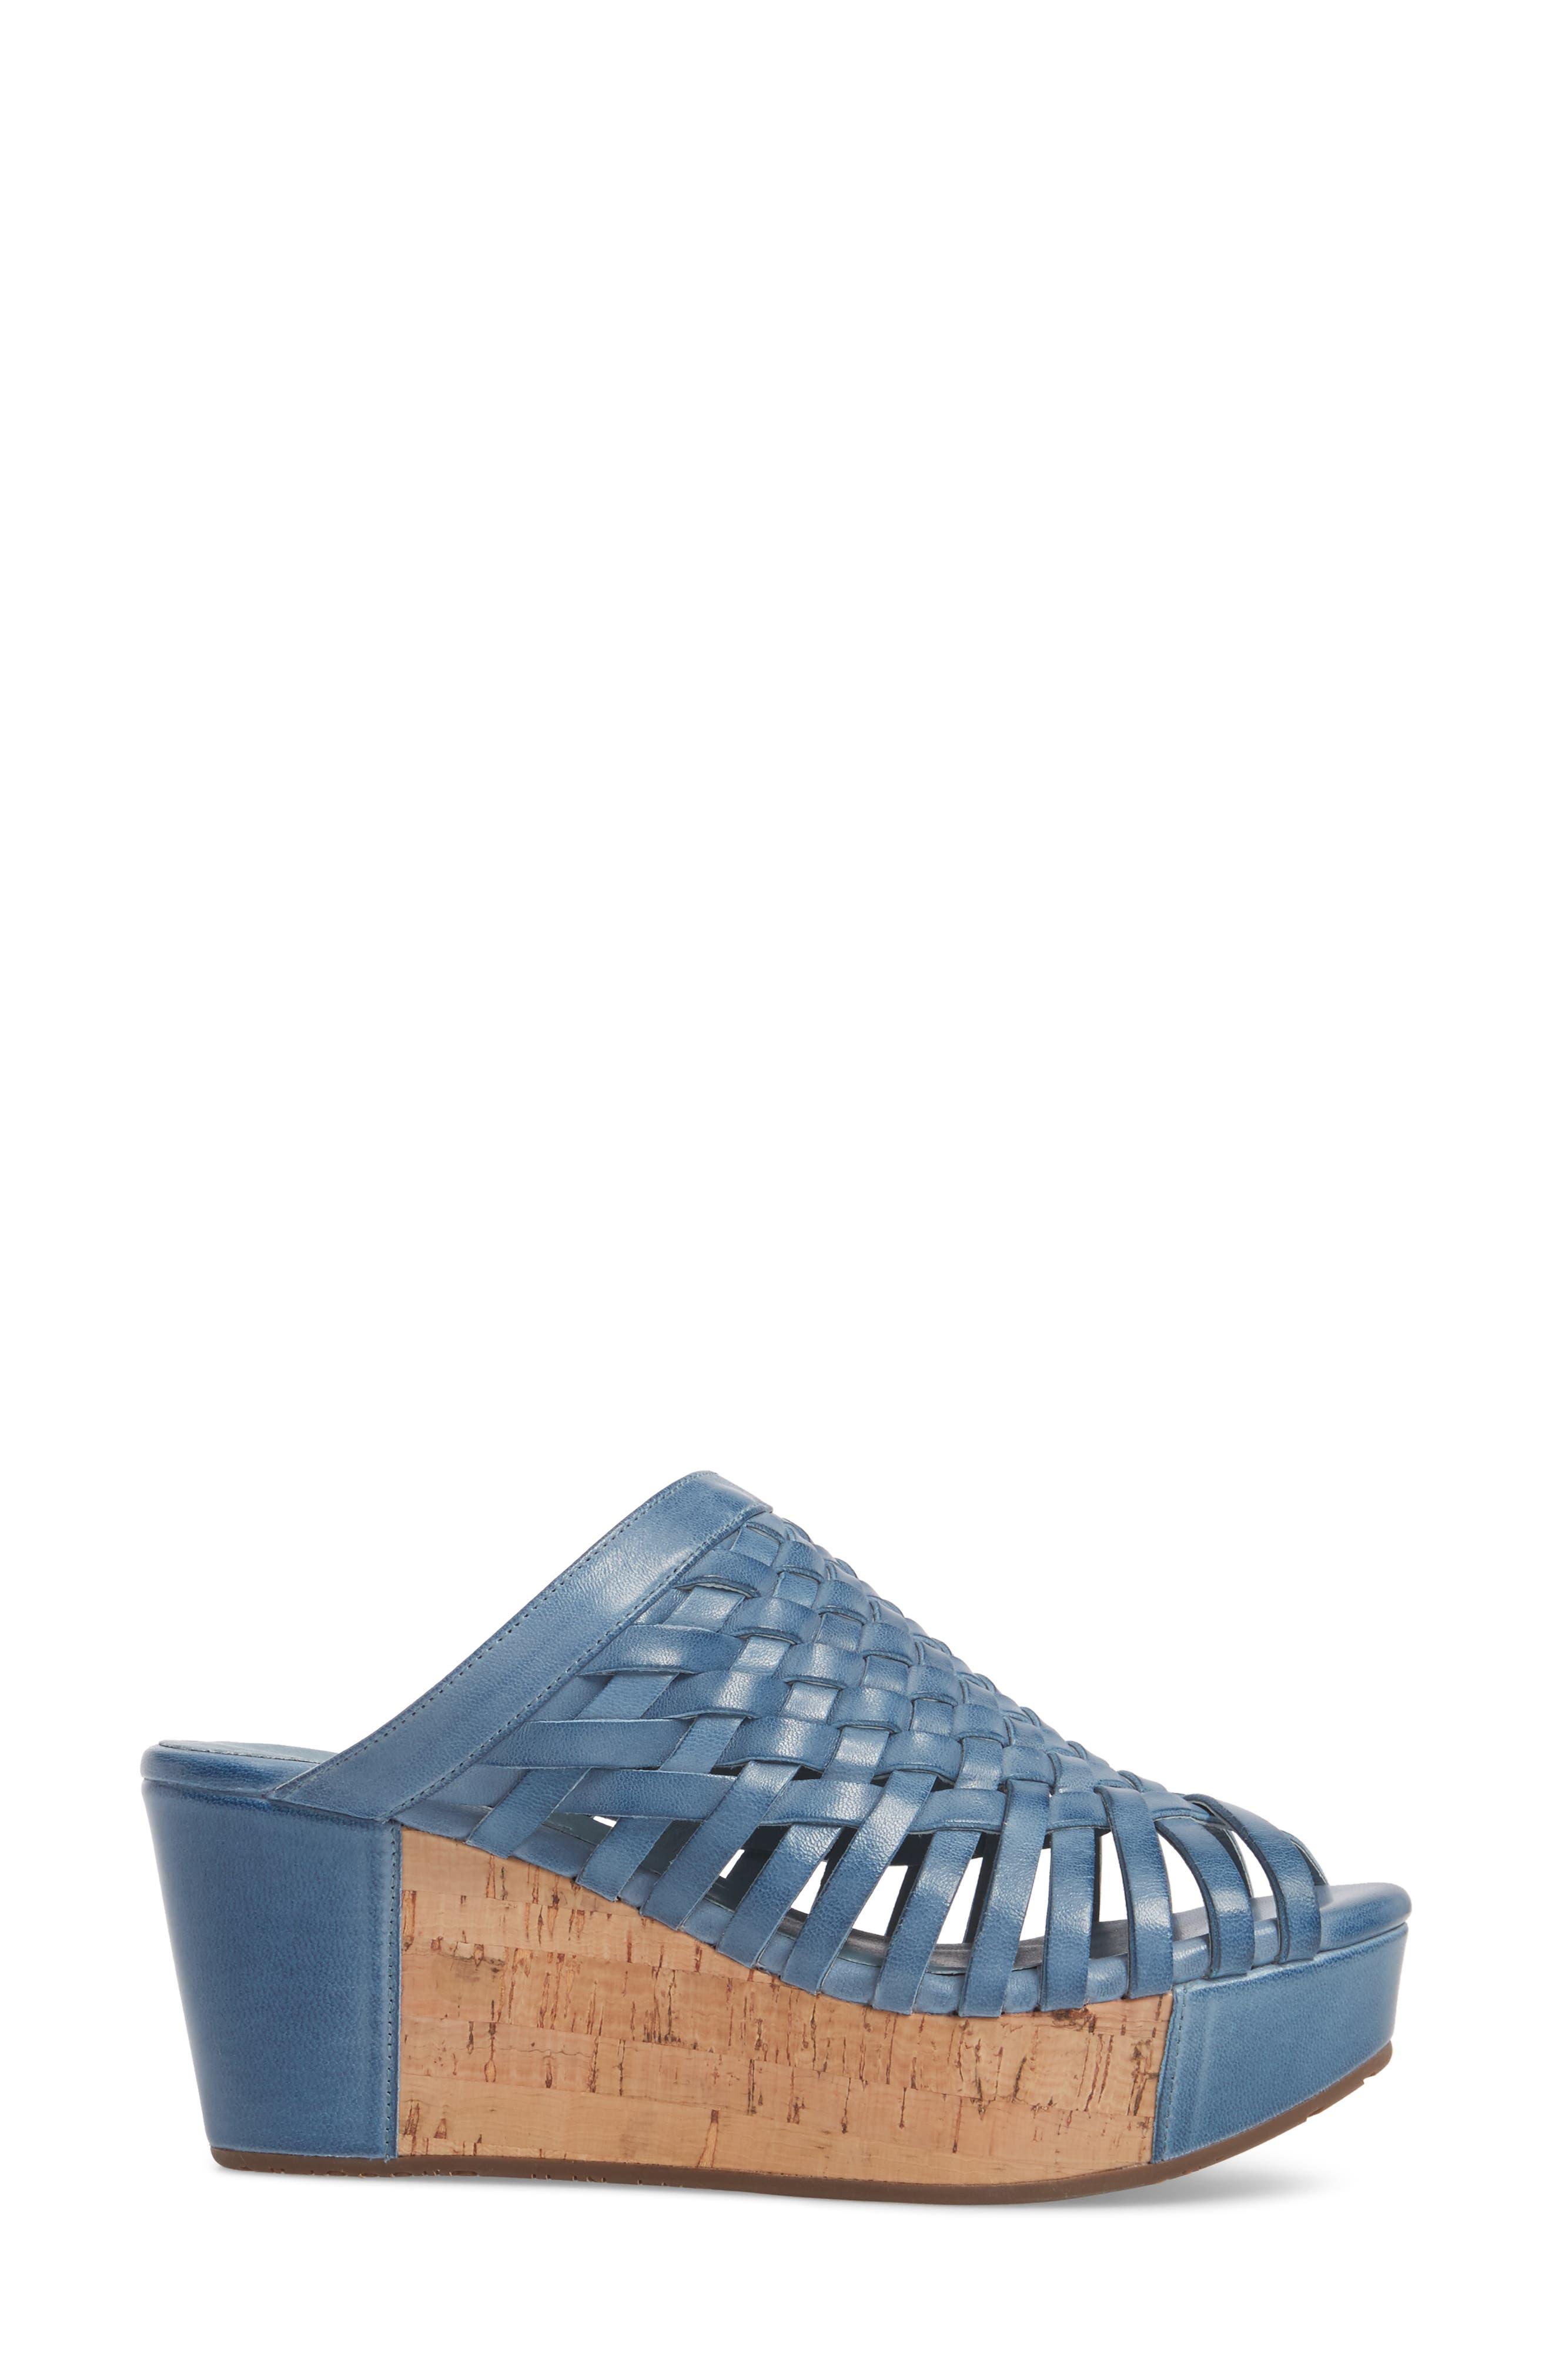 Walda Platform Wedge Sandal,                             Alternate thumbnail 9, color,